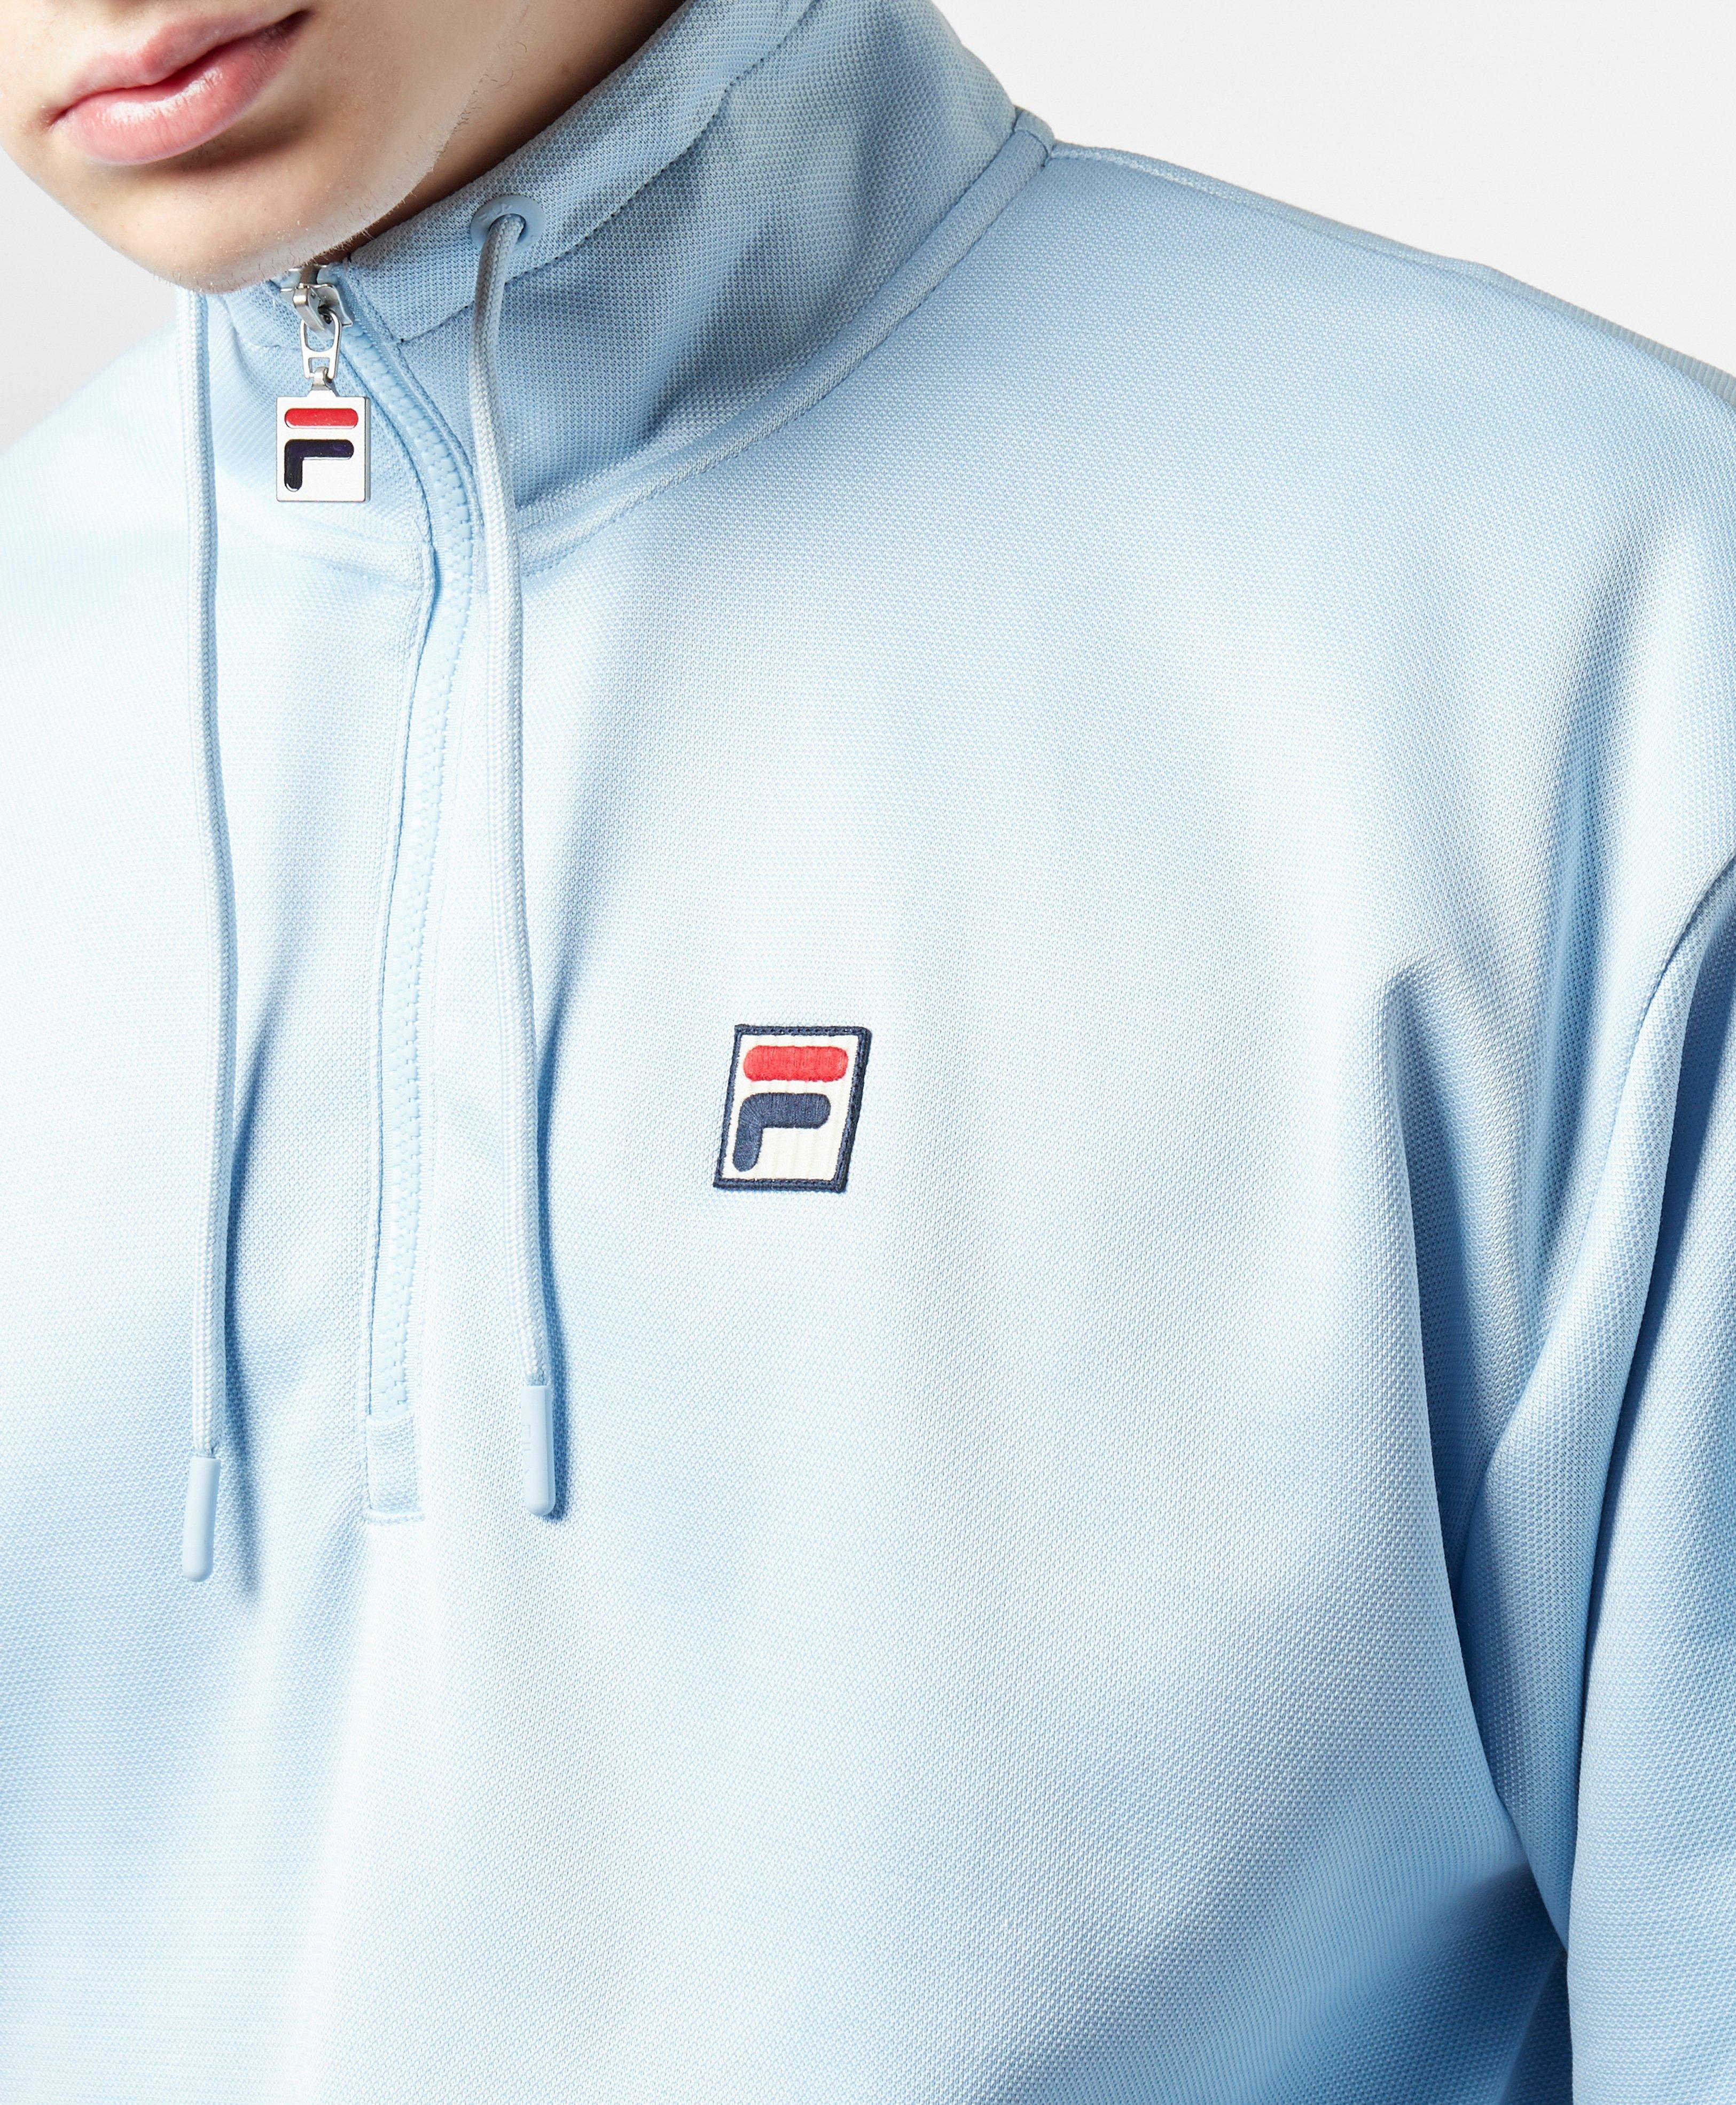 faa65ed7d993 Fila - Blue Tape Tip Half Zip Sweatshirt for Men - Lyst. View fullscreen